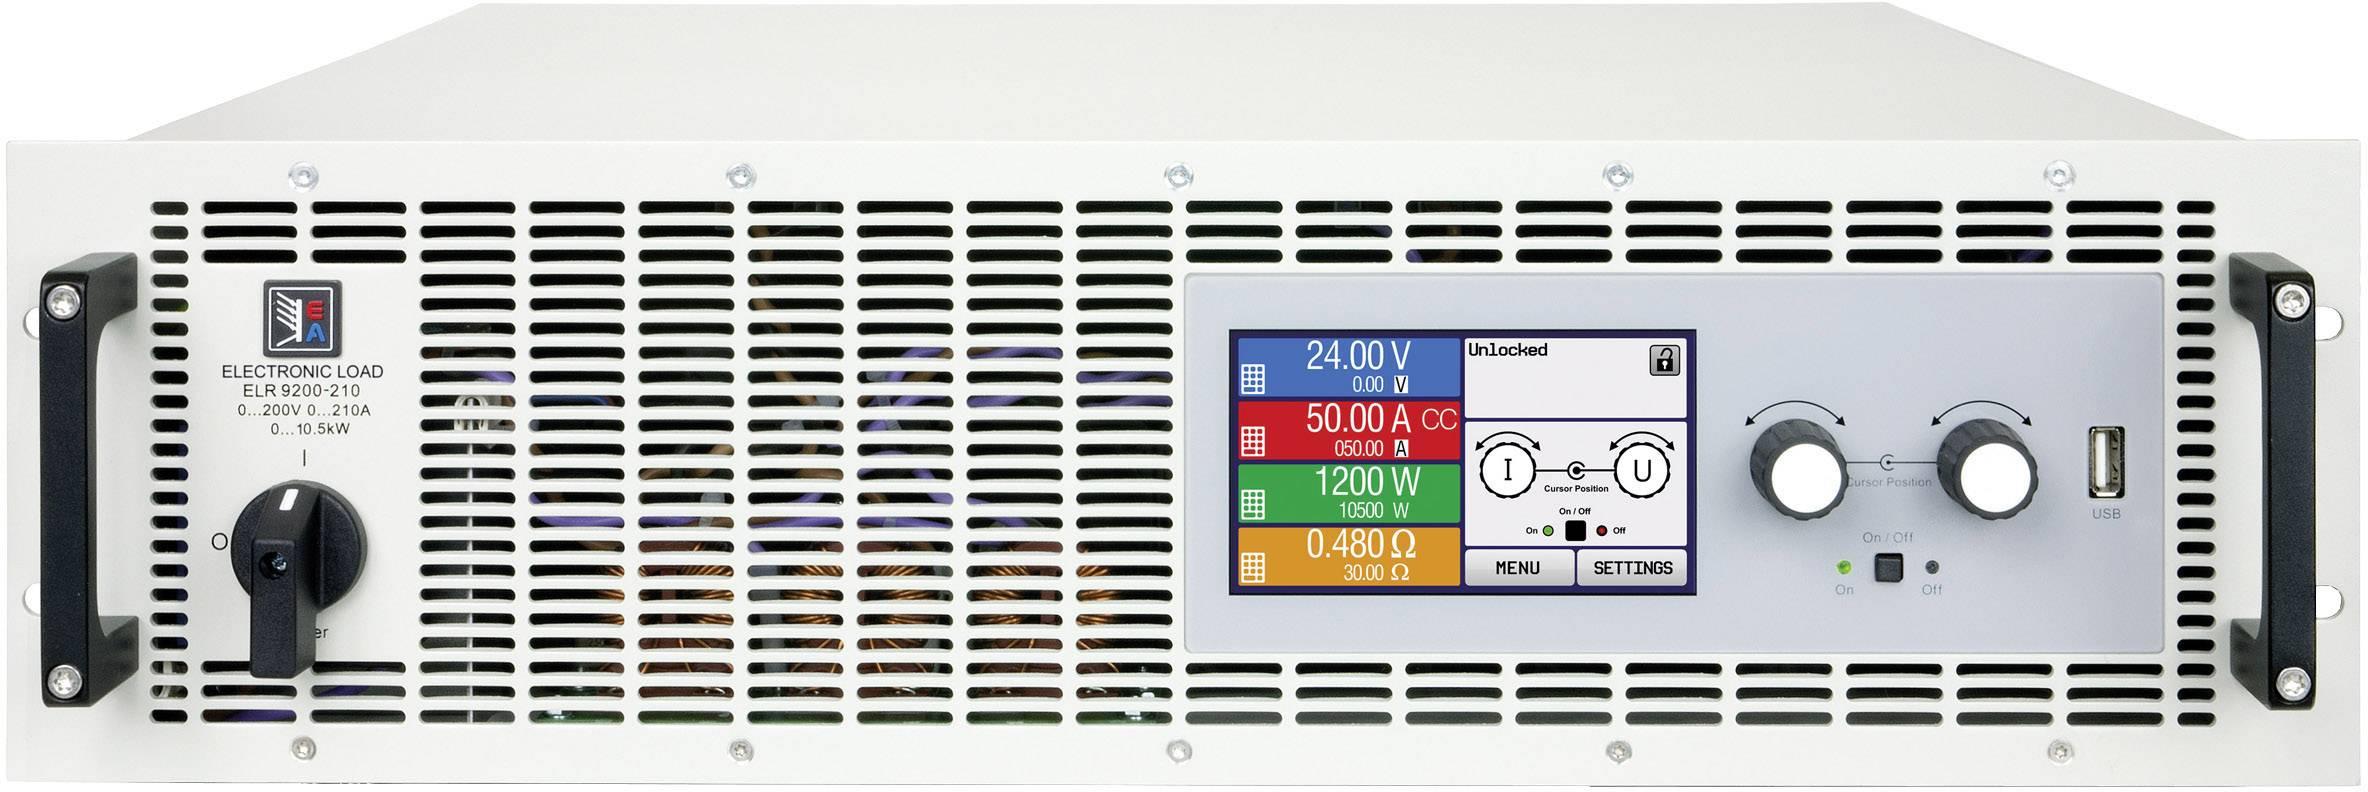 Elektronická zátěž EA-ELR 9250-210 3U, 250 V/DC, 210 A, 10500 W